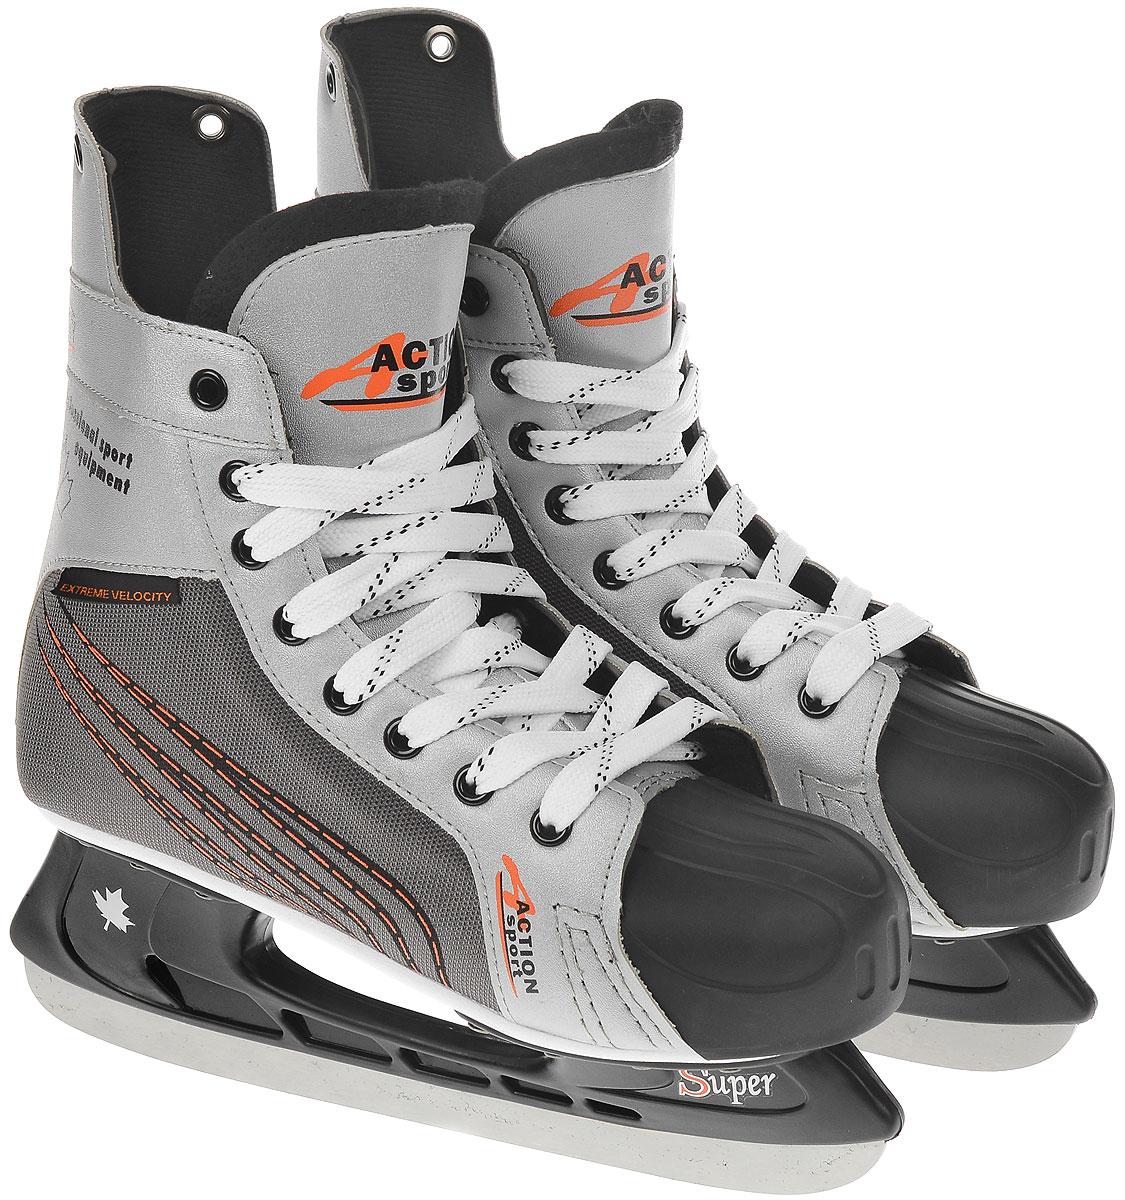 Коньки хоккейные мужские Action, цвет: белый, серый. PW-216N. Размер 37